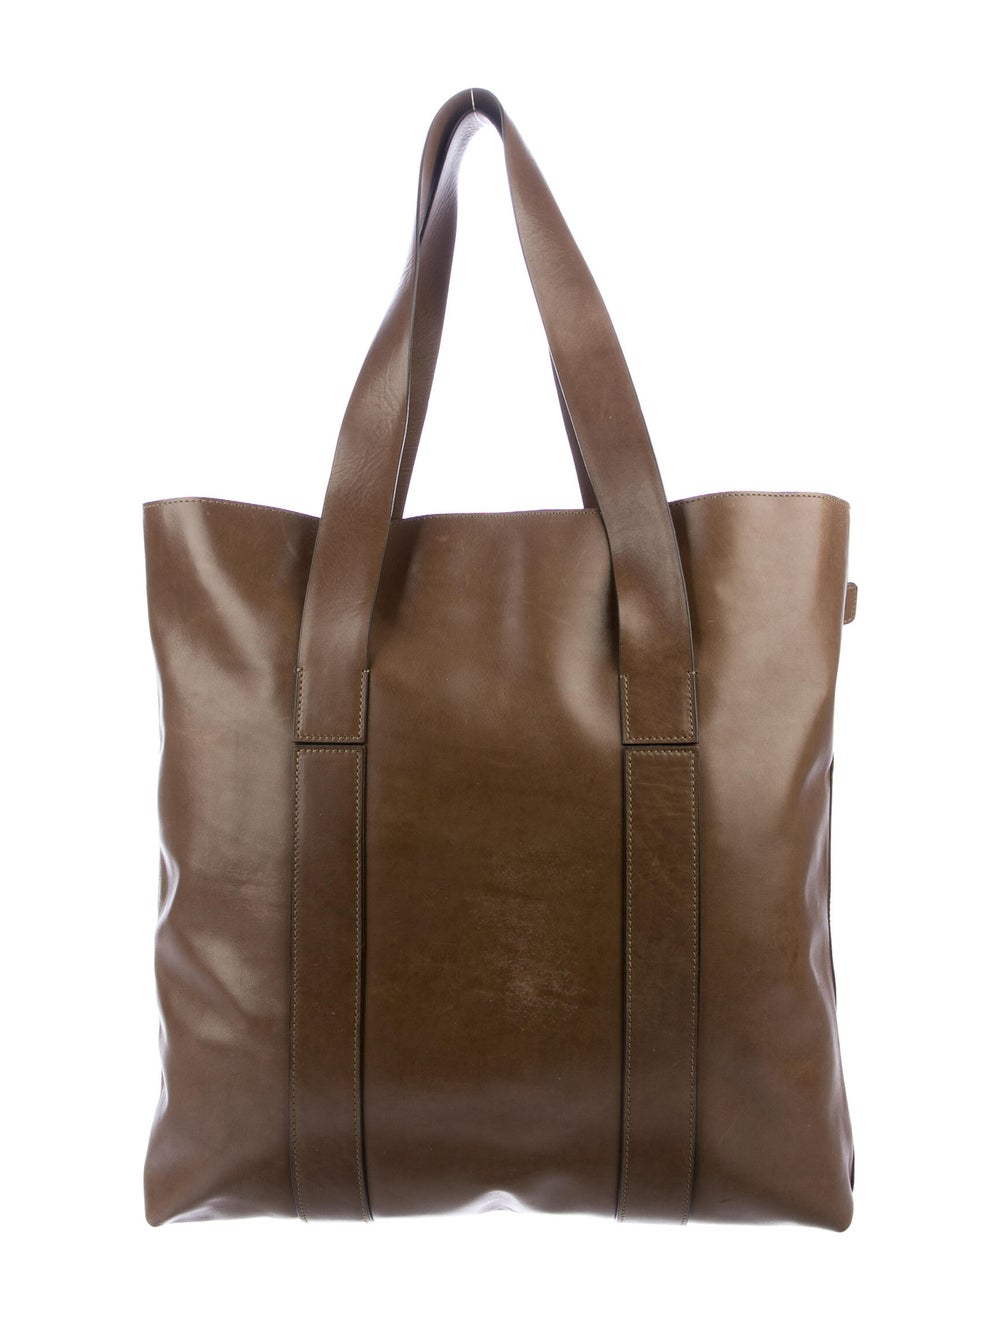 Marni Leather Tote Brown - image 4